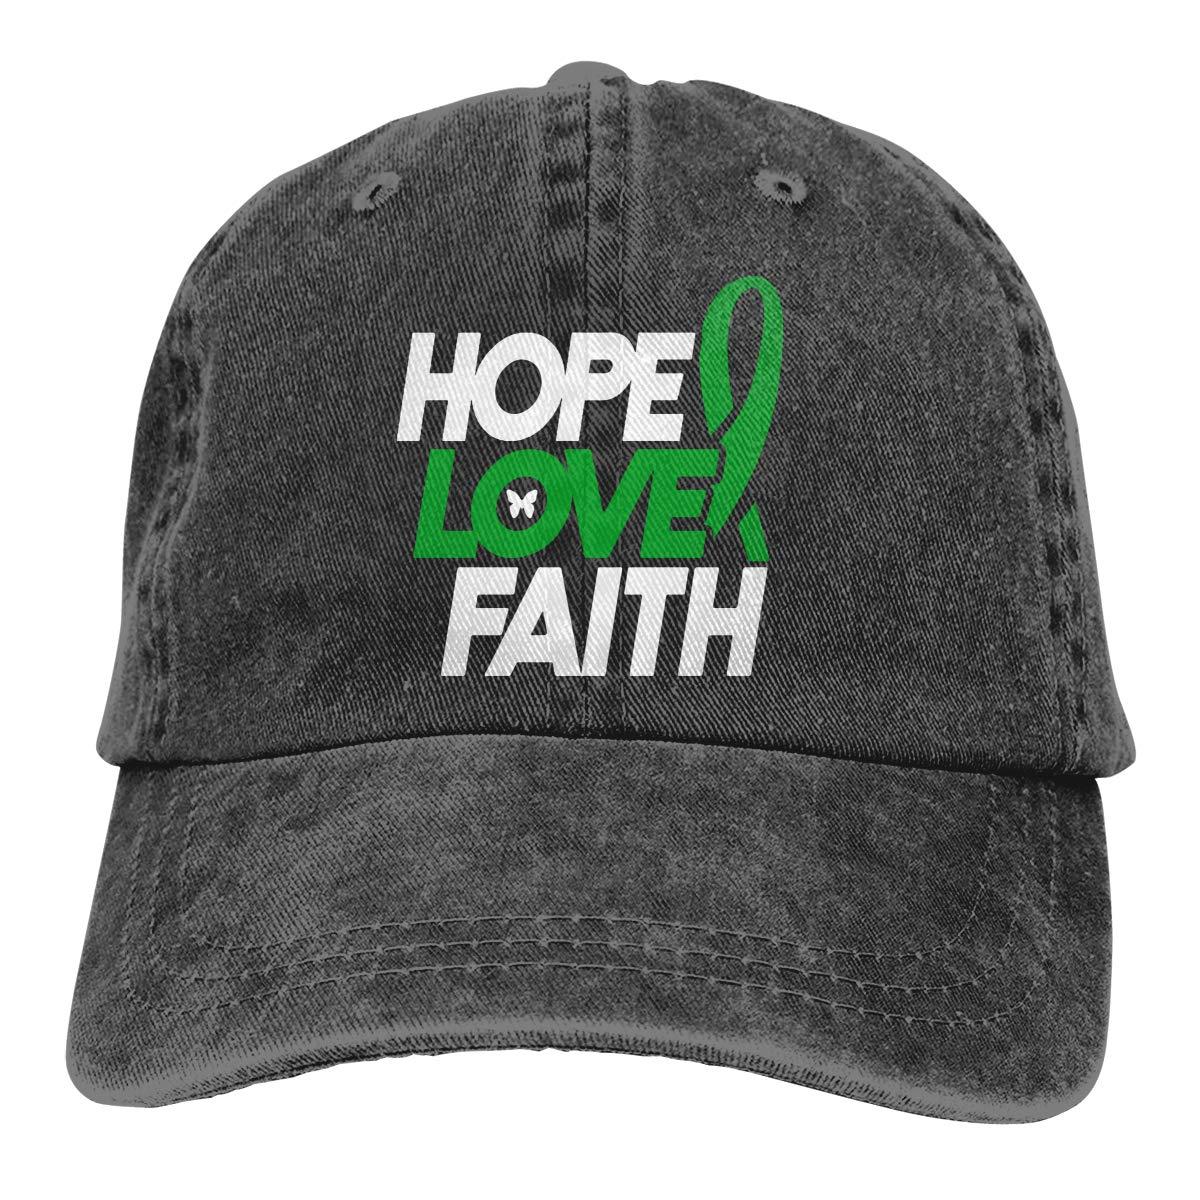 PMGM-C Brain Injury Awareness Adult Personalize Cowboy Hat Casquette Adjustable Baseball Cap